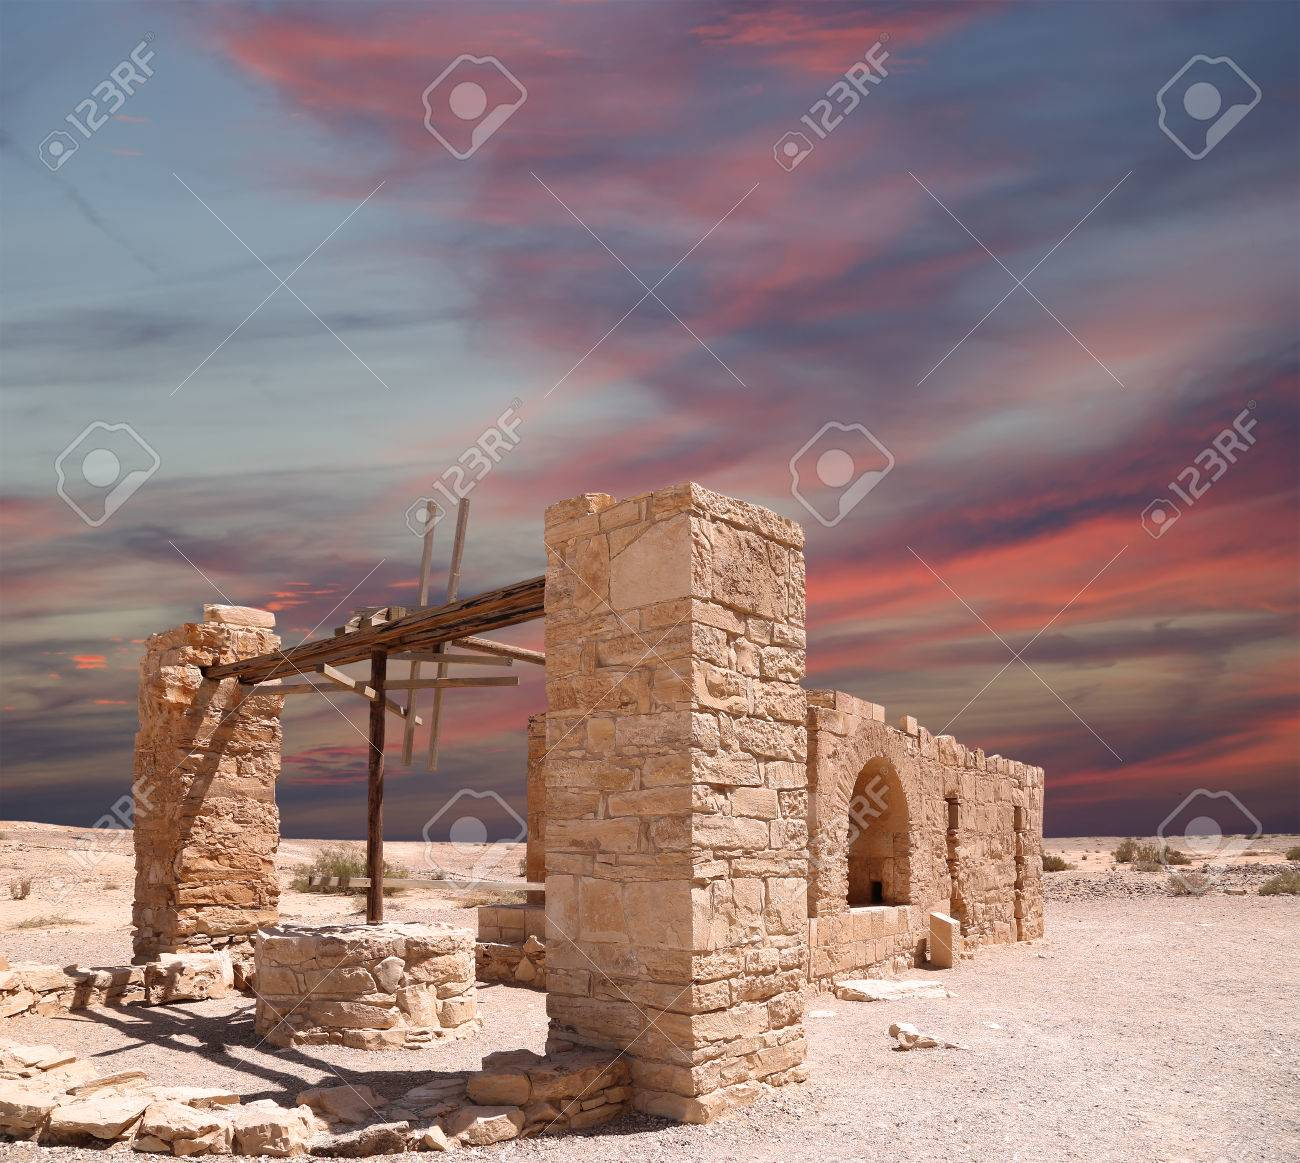 Quseir (Qasr) Amra desert castle near Amman, Jordan  famous fresco's